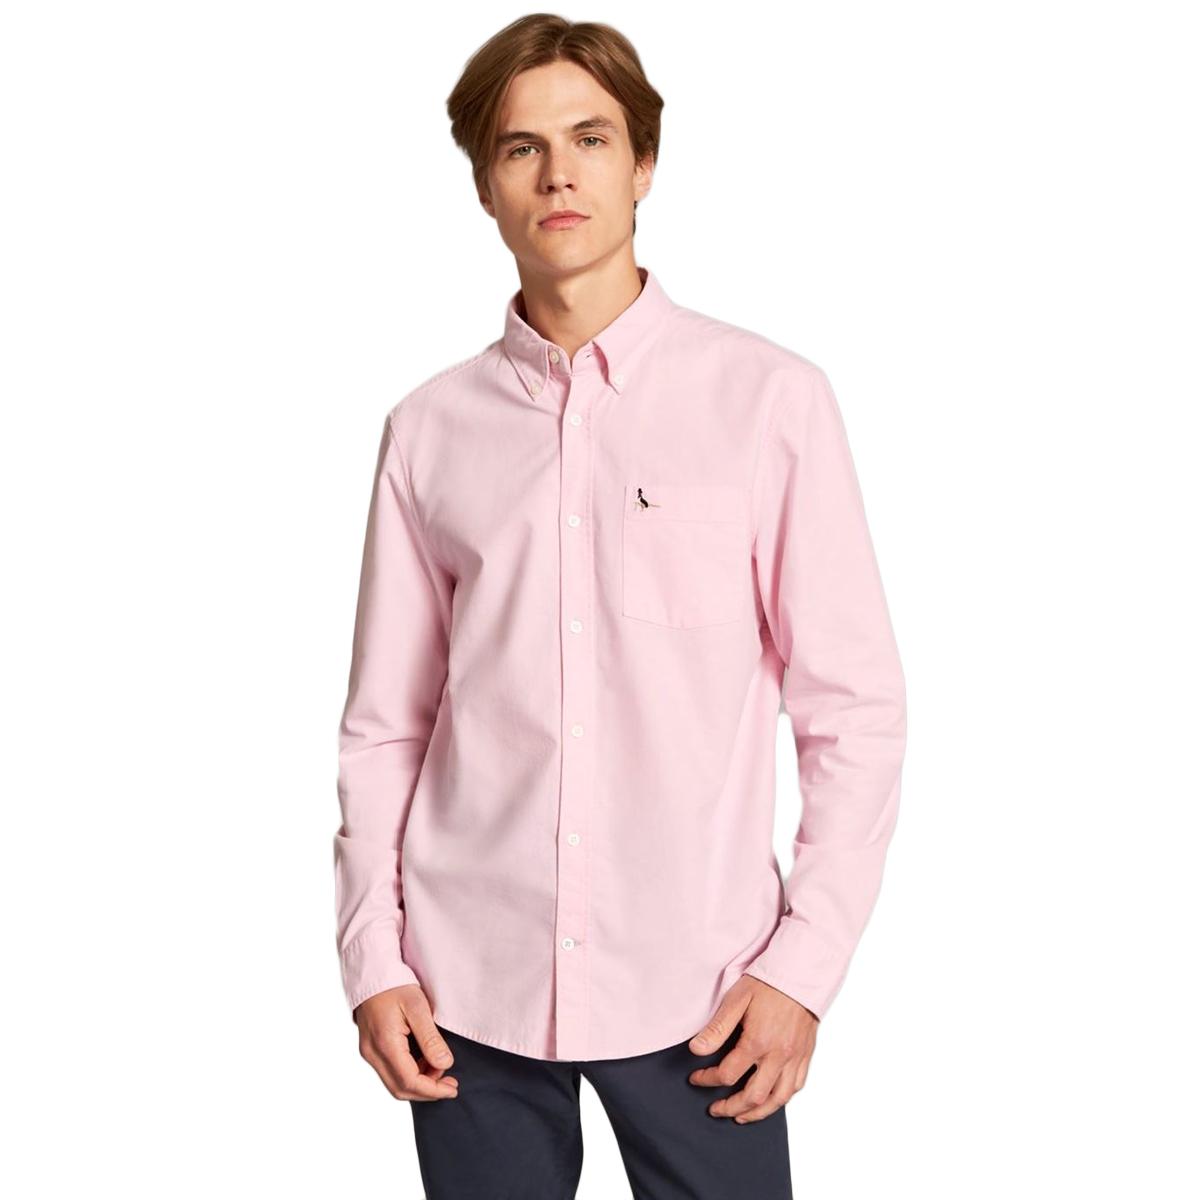 Jack Wills Men's Wadsworth Plain Oxford Shirt - Red, L